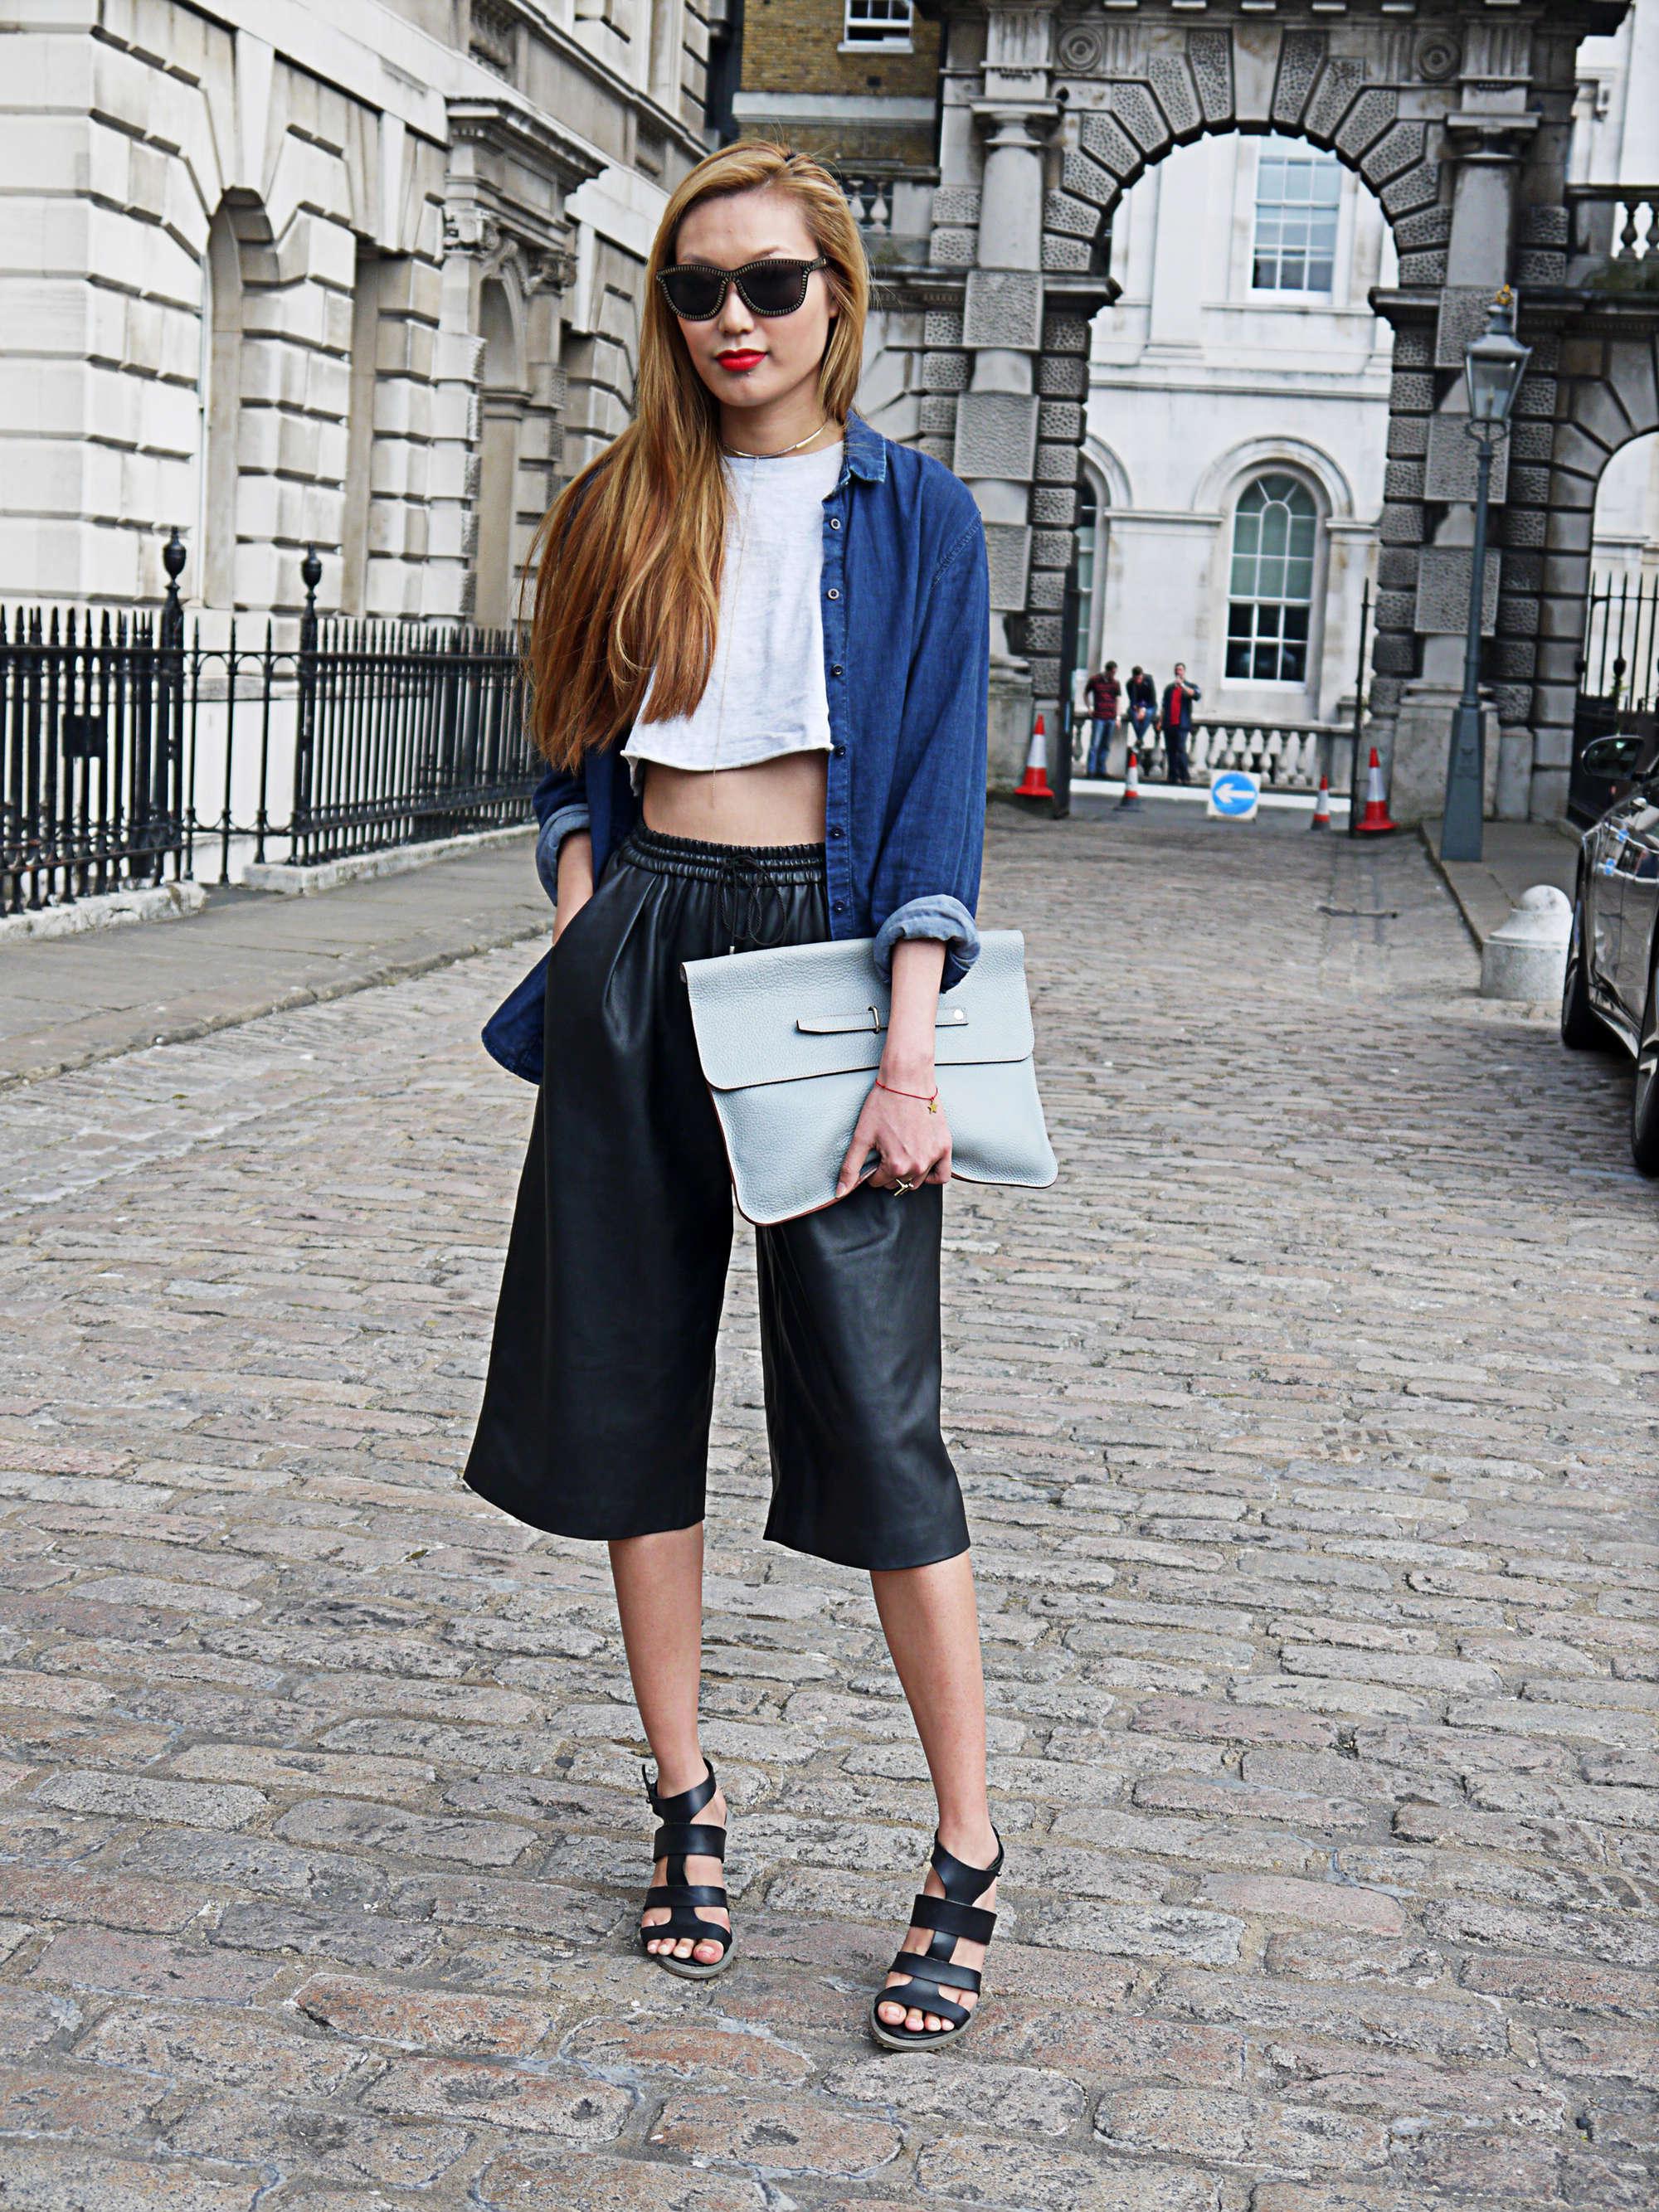 London Fashion Week Ss15 Street Style Day 2 Ldnfashion